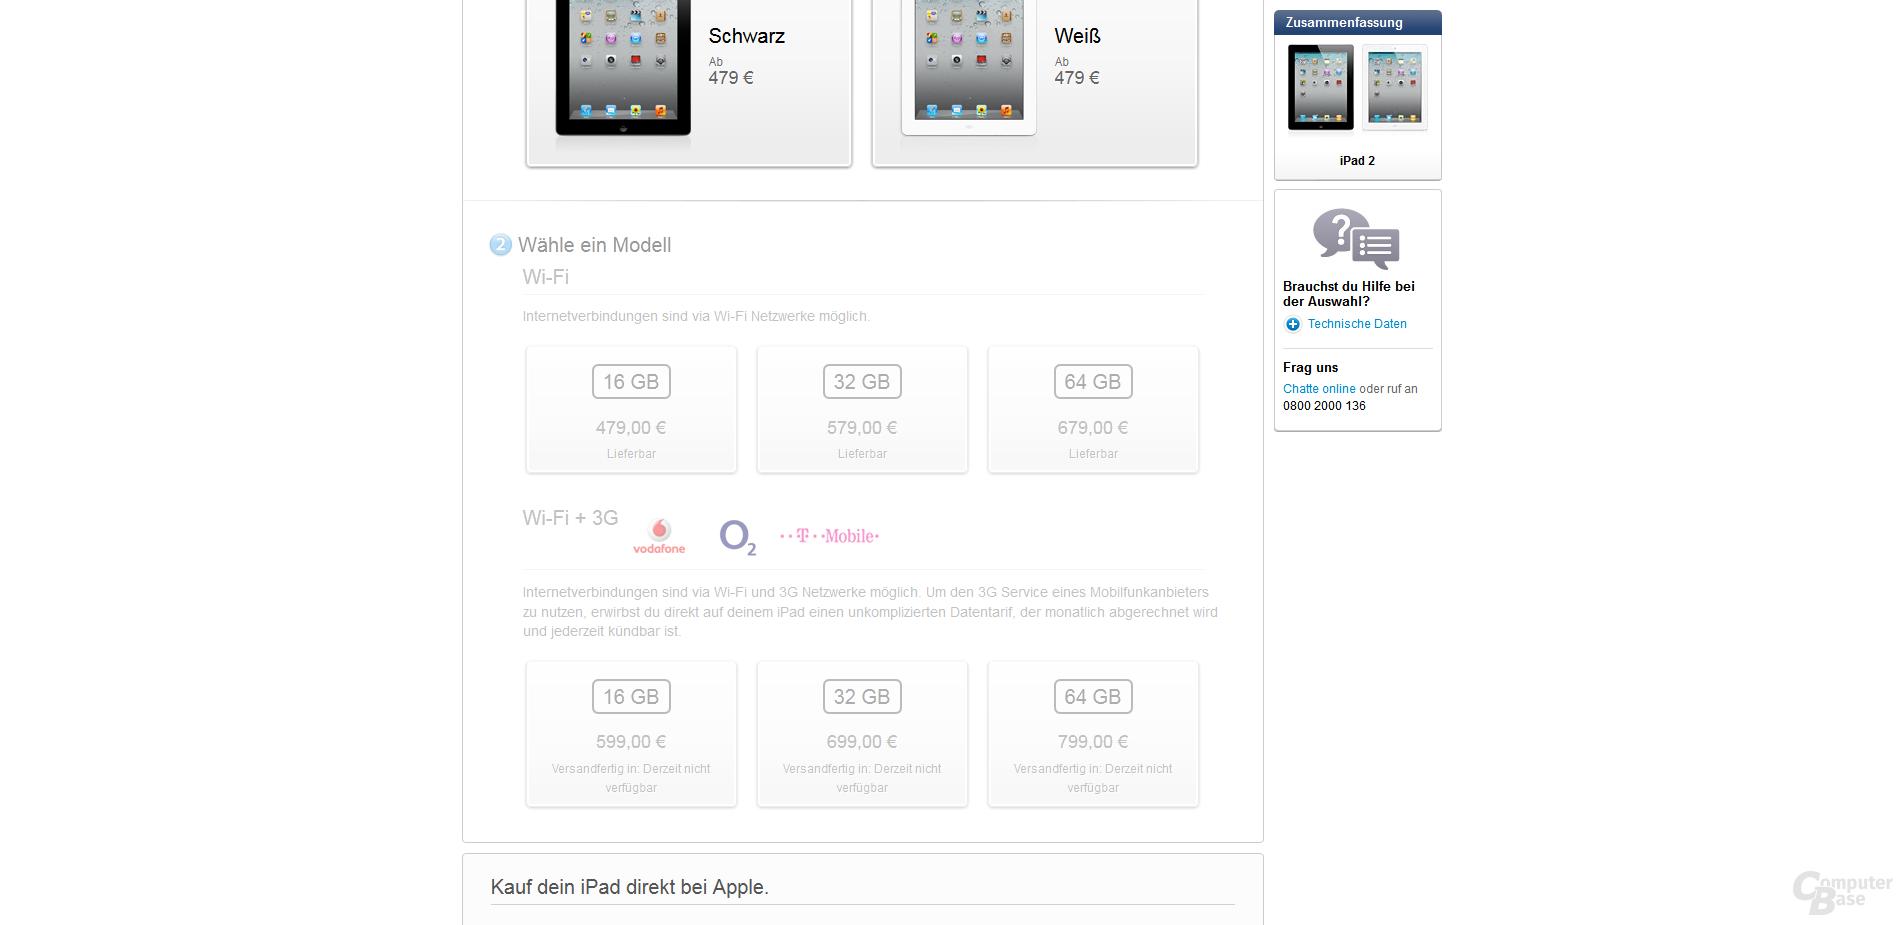 Lieferstatus: iPad 2 mit UMTS-Modul nicht verfügbar